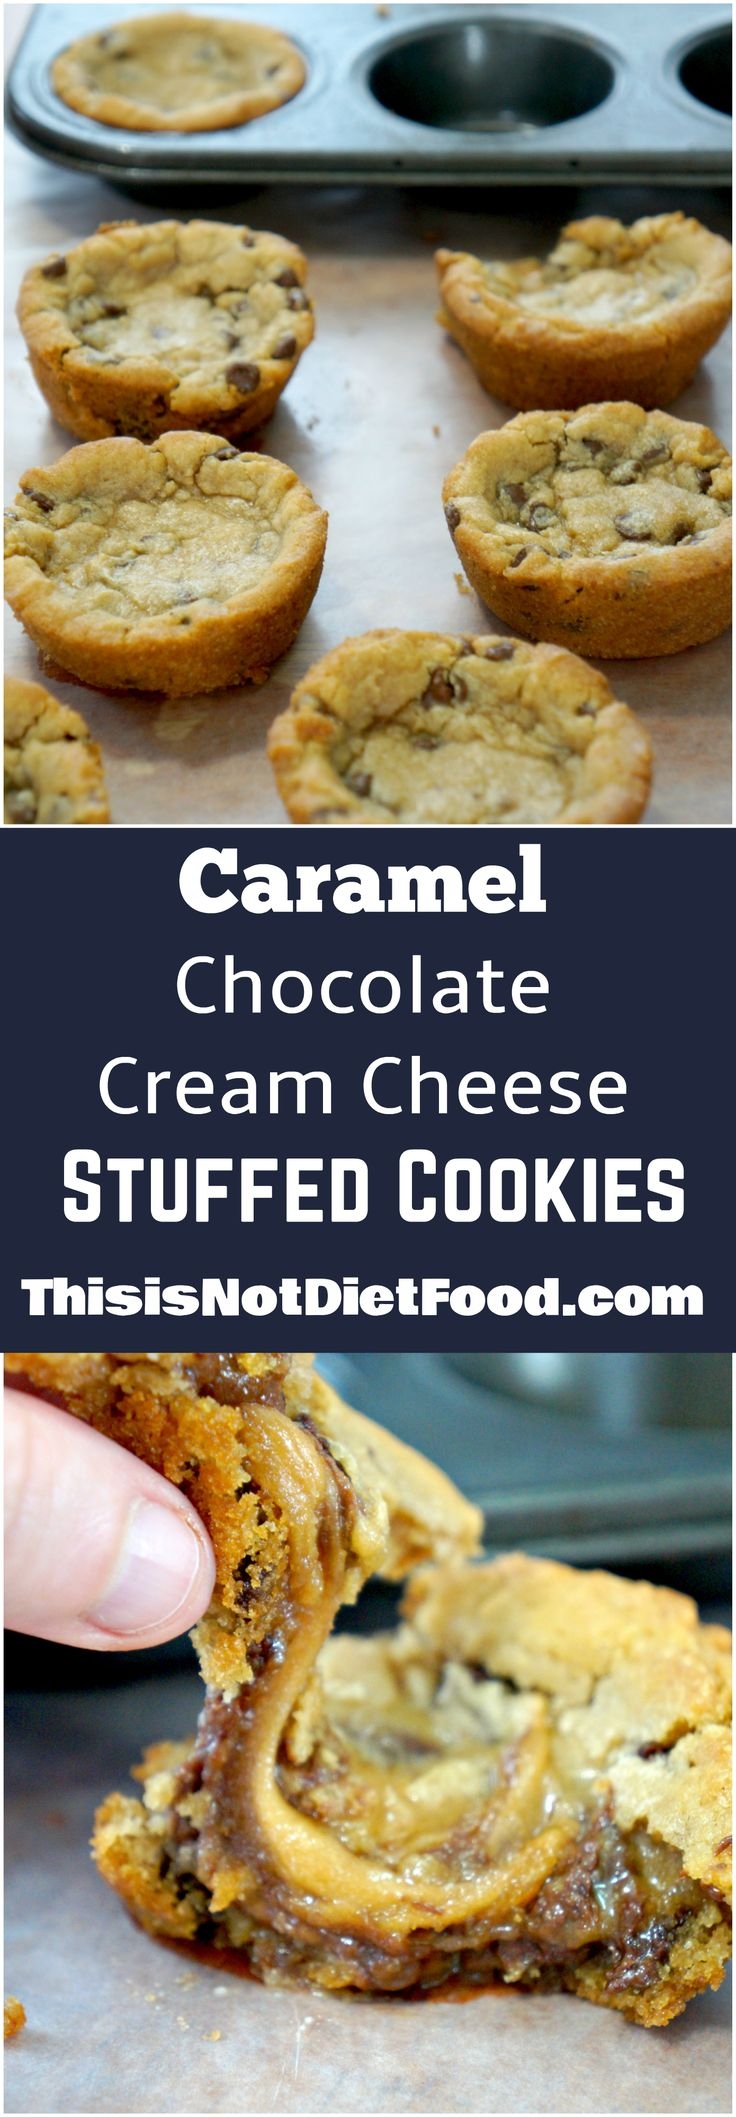 Caramel Chocolate Cream Cheese Stuffed Cookies. Chocolate chip cookies stuffed with caramel and chocolate cream cheese. Easy 3 ingredient dessert recipe.